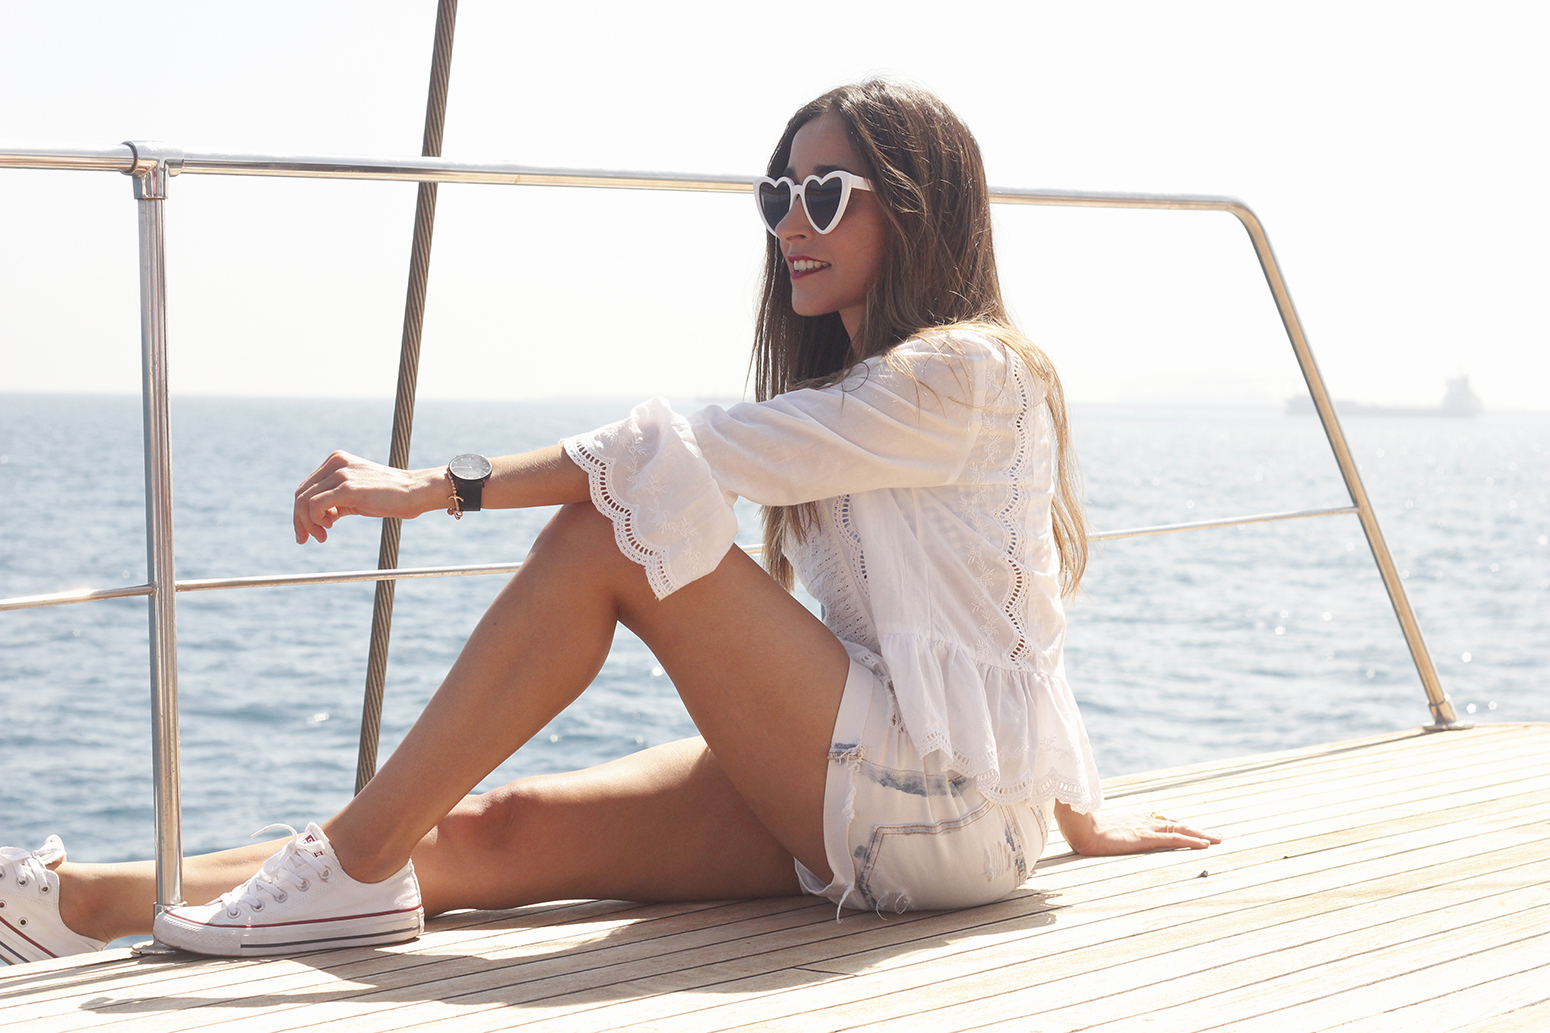 boat ride in Barcelona lottie london make up summer street style outfit 201807